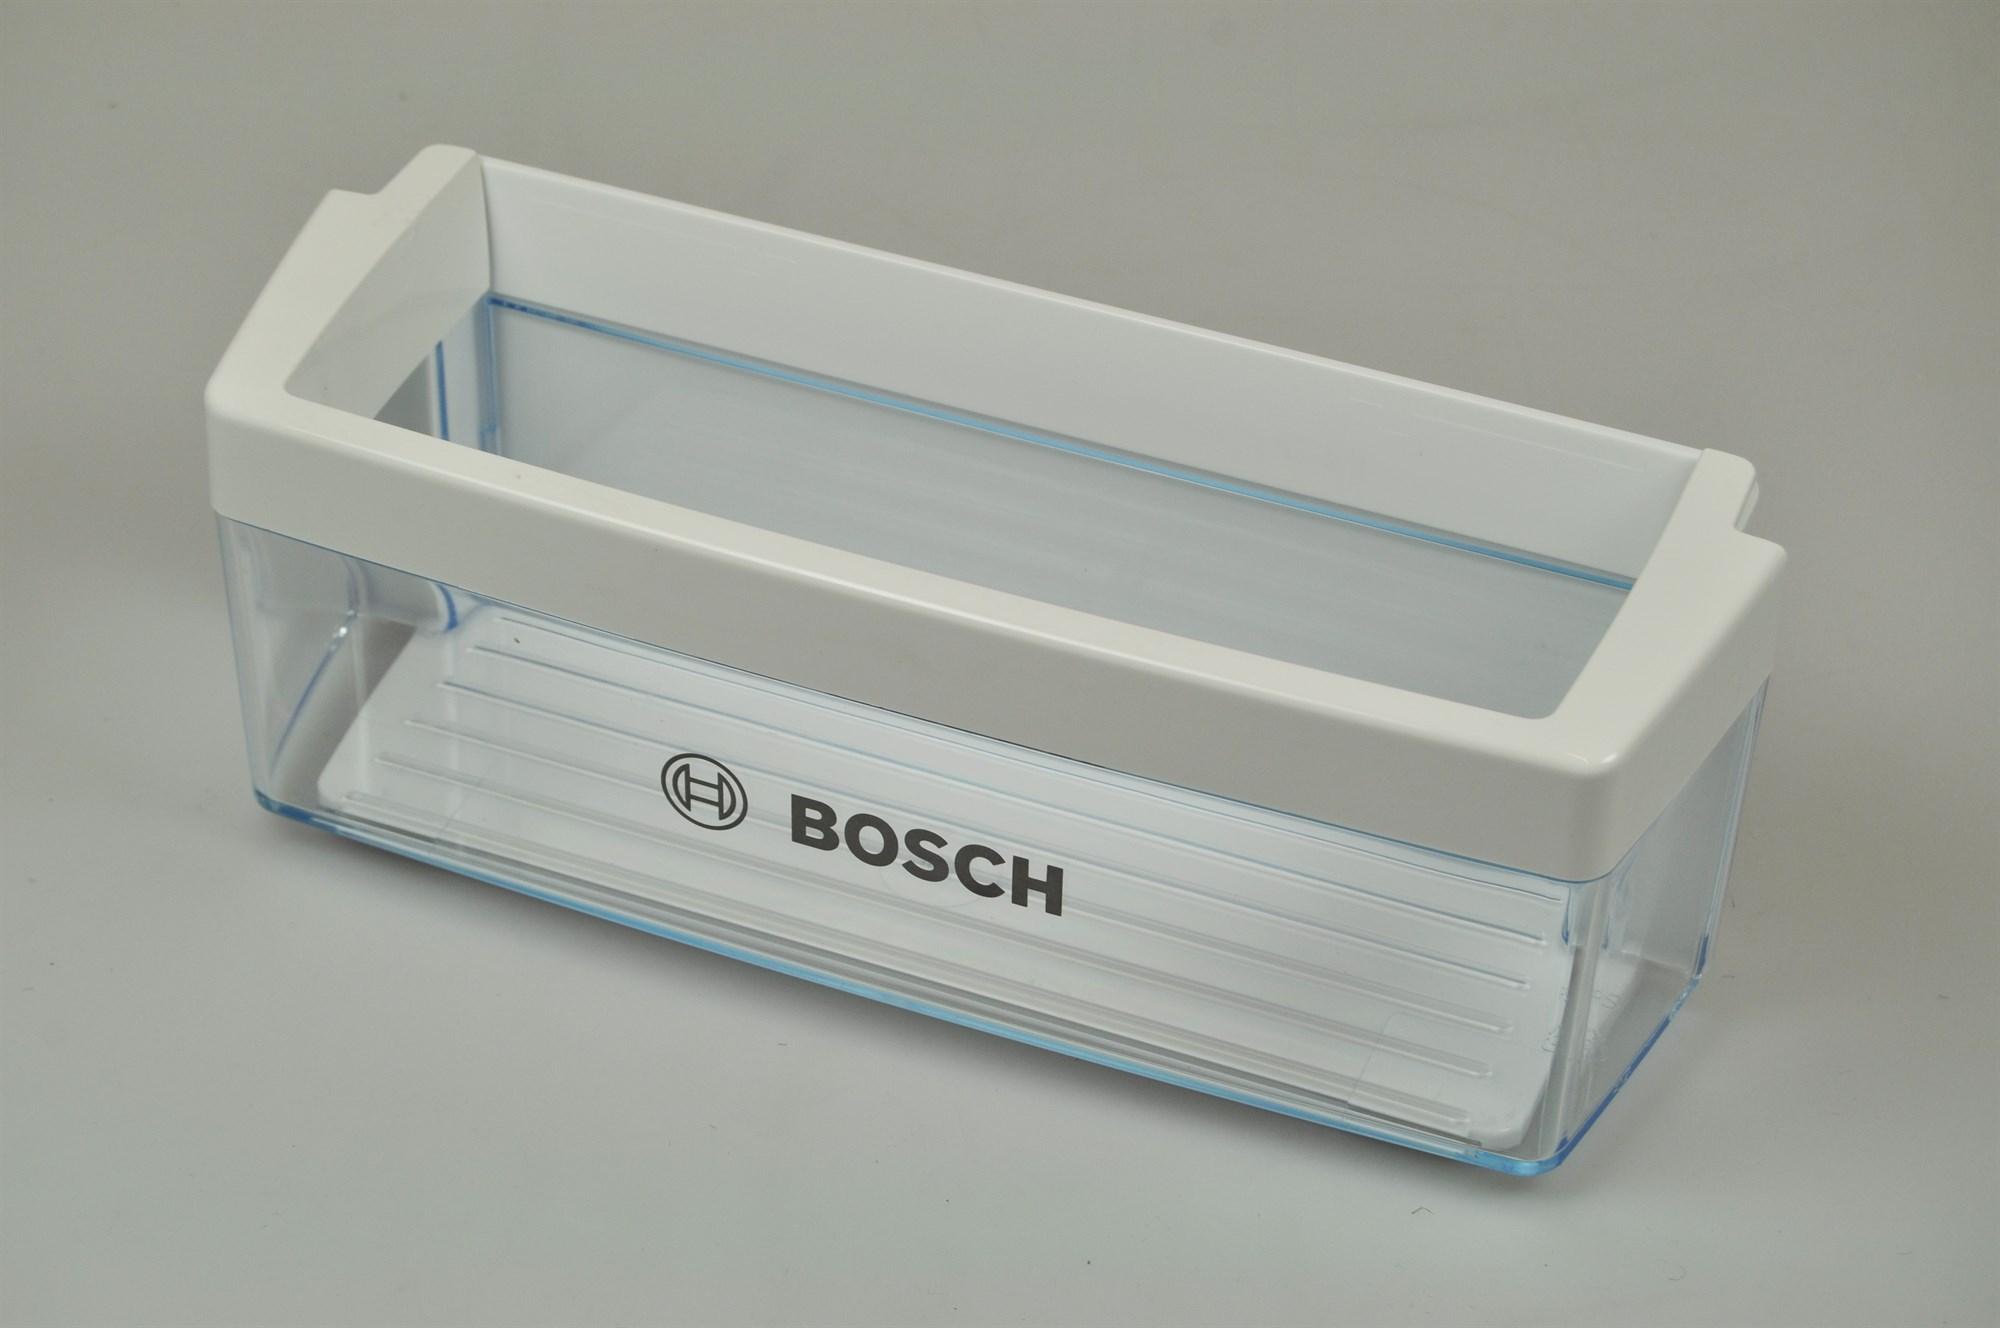 Side By Side Kühlschrank Bosch Schwarz : Türablage bosch side by side kühlschrank